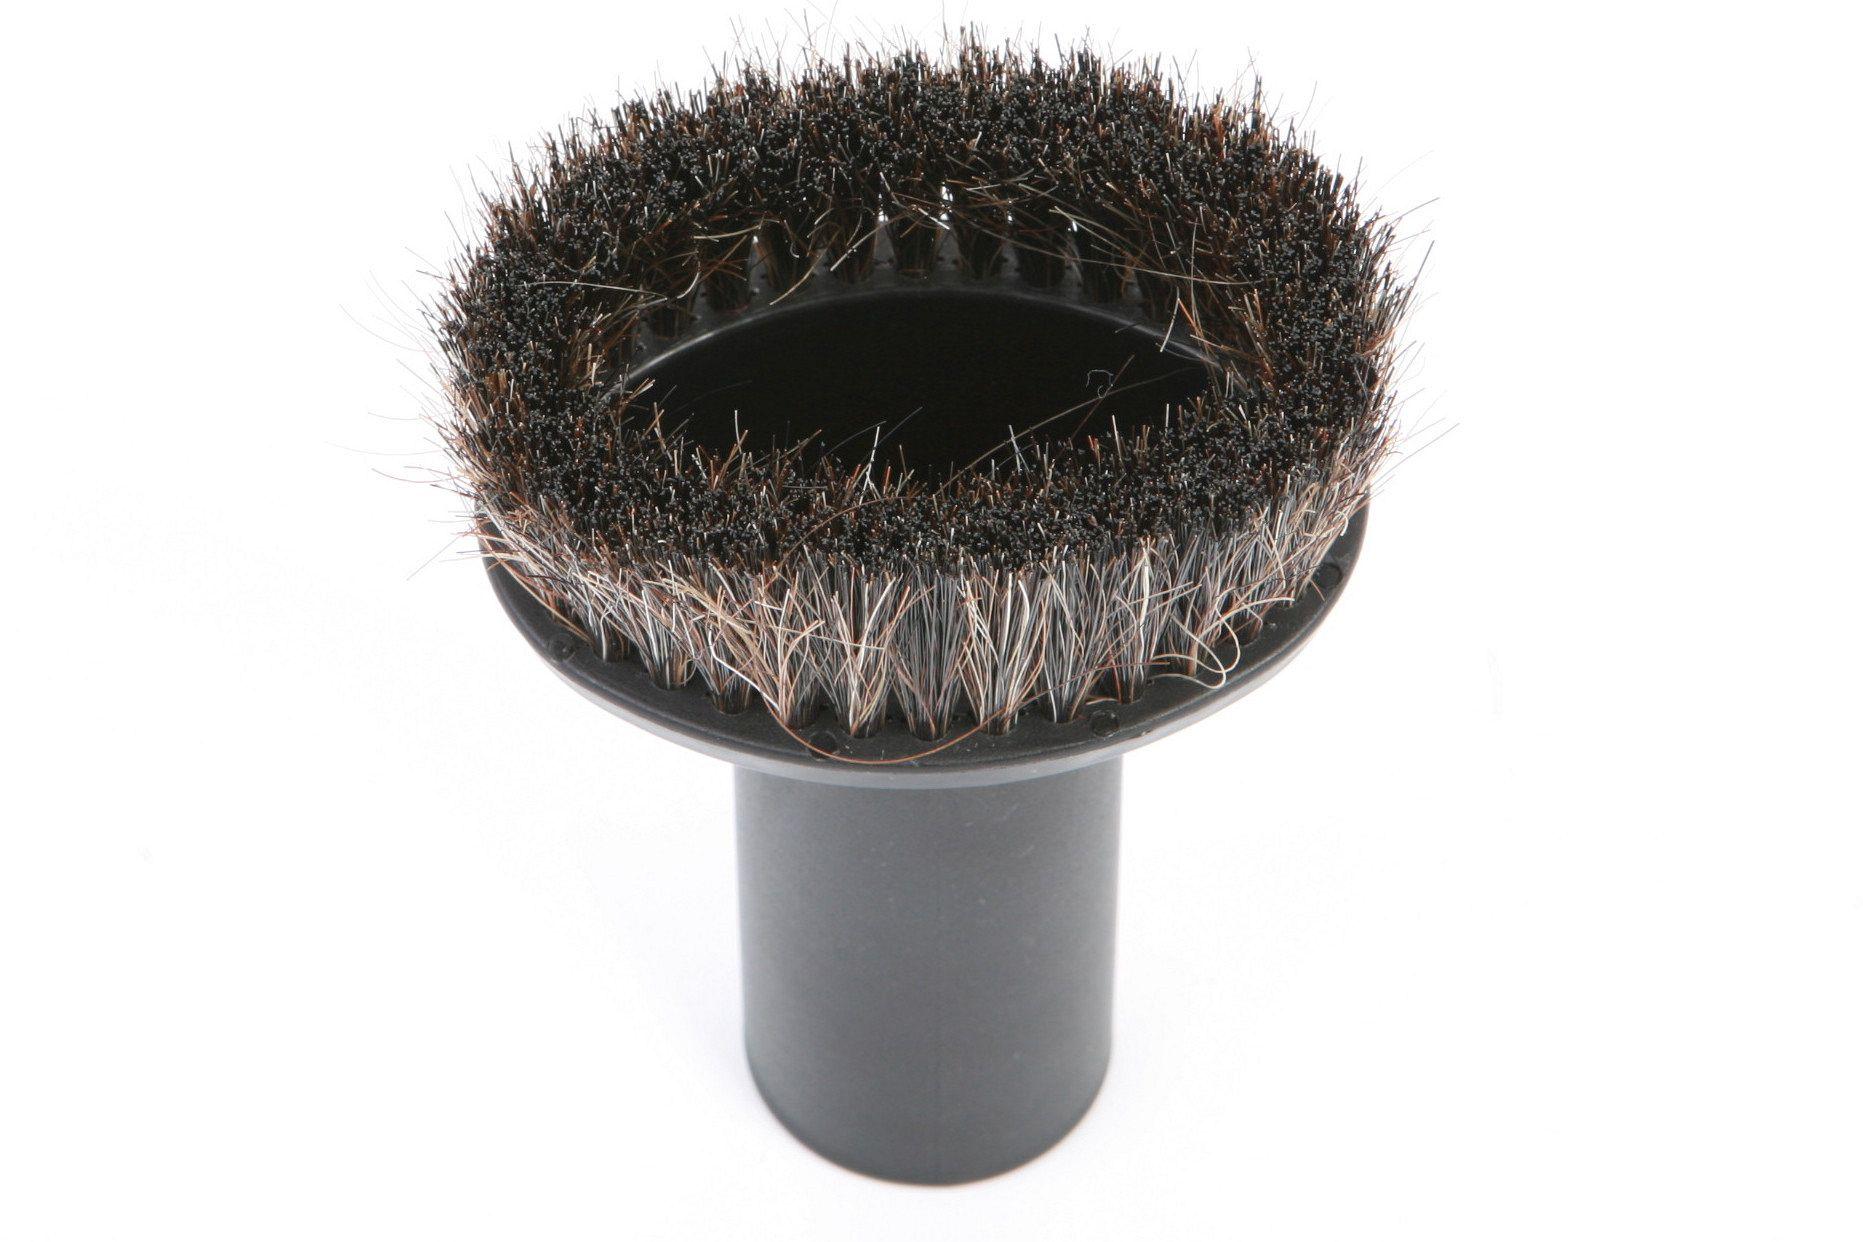 staubsauger zubeh r m belpinsel rosshaar 32 mm. Black Bedroom Furniture Sets. Home Design Ideas